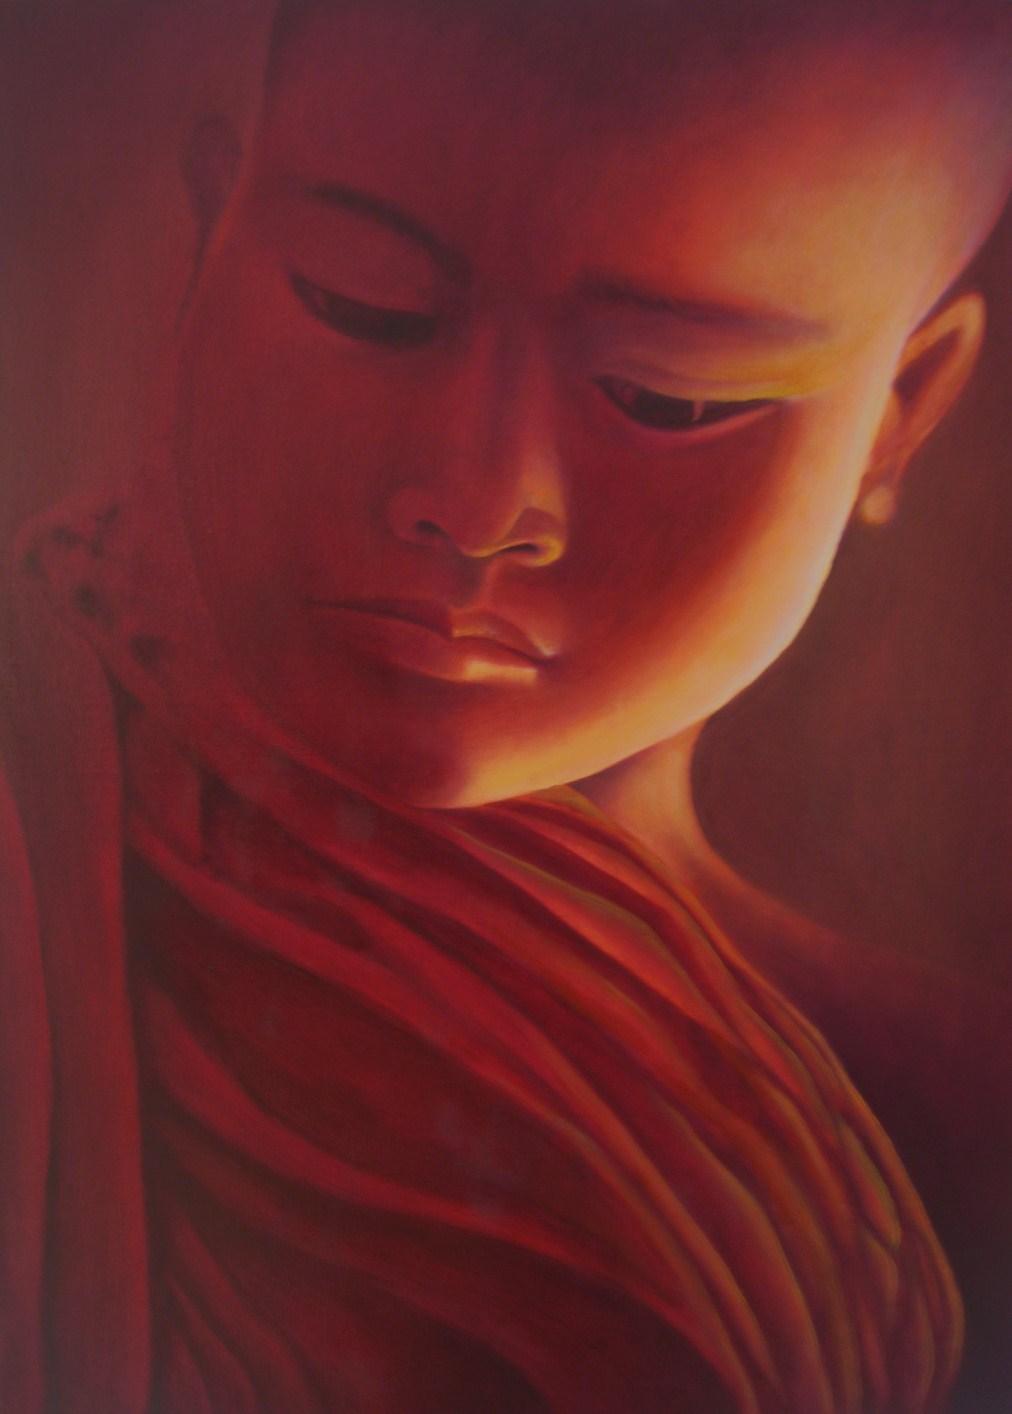 Peinture moine bouddhiste - Peinture sur toile bouddha ...